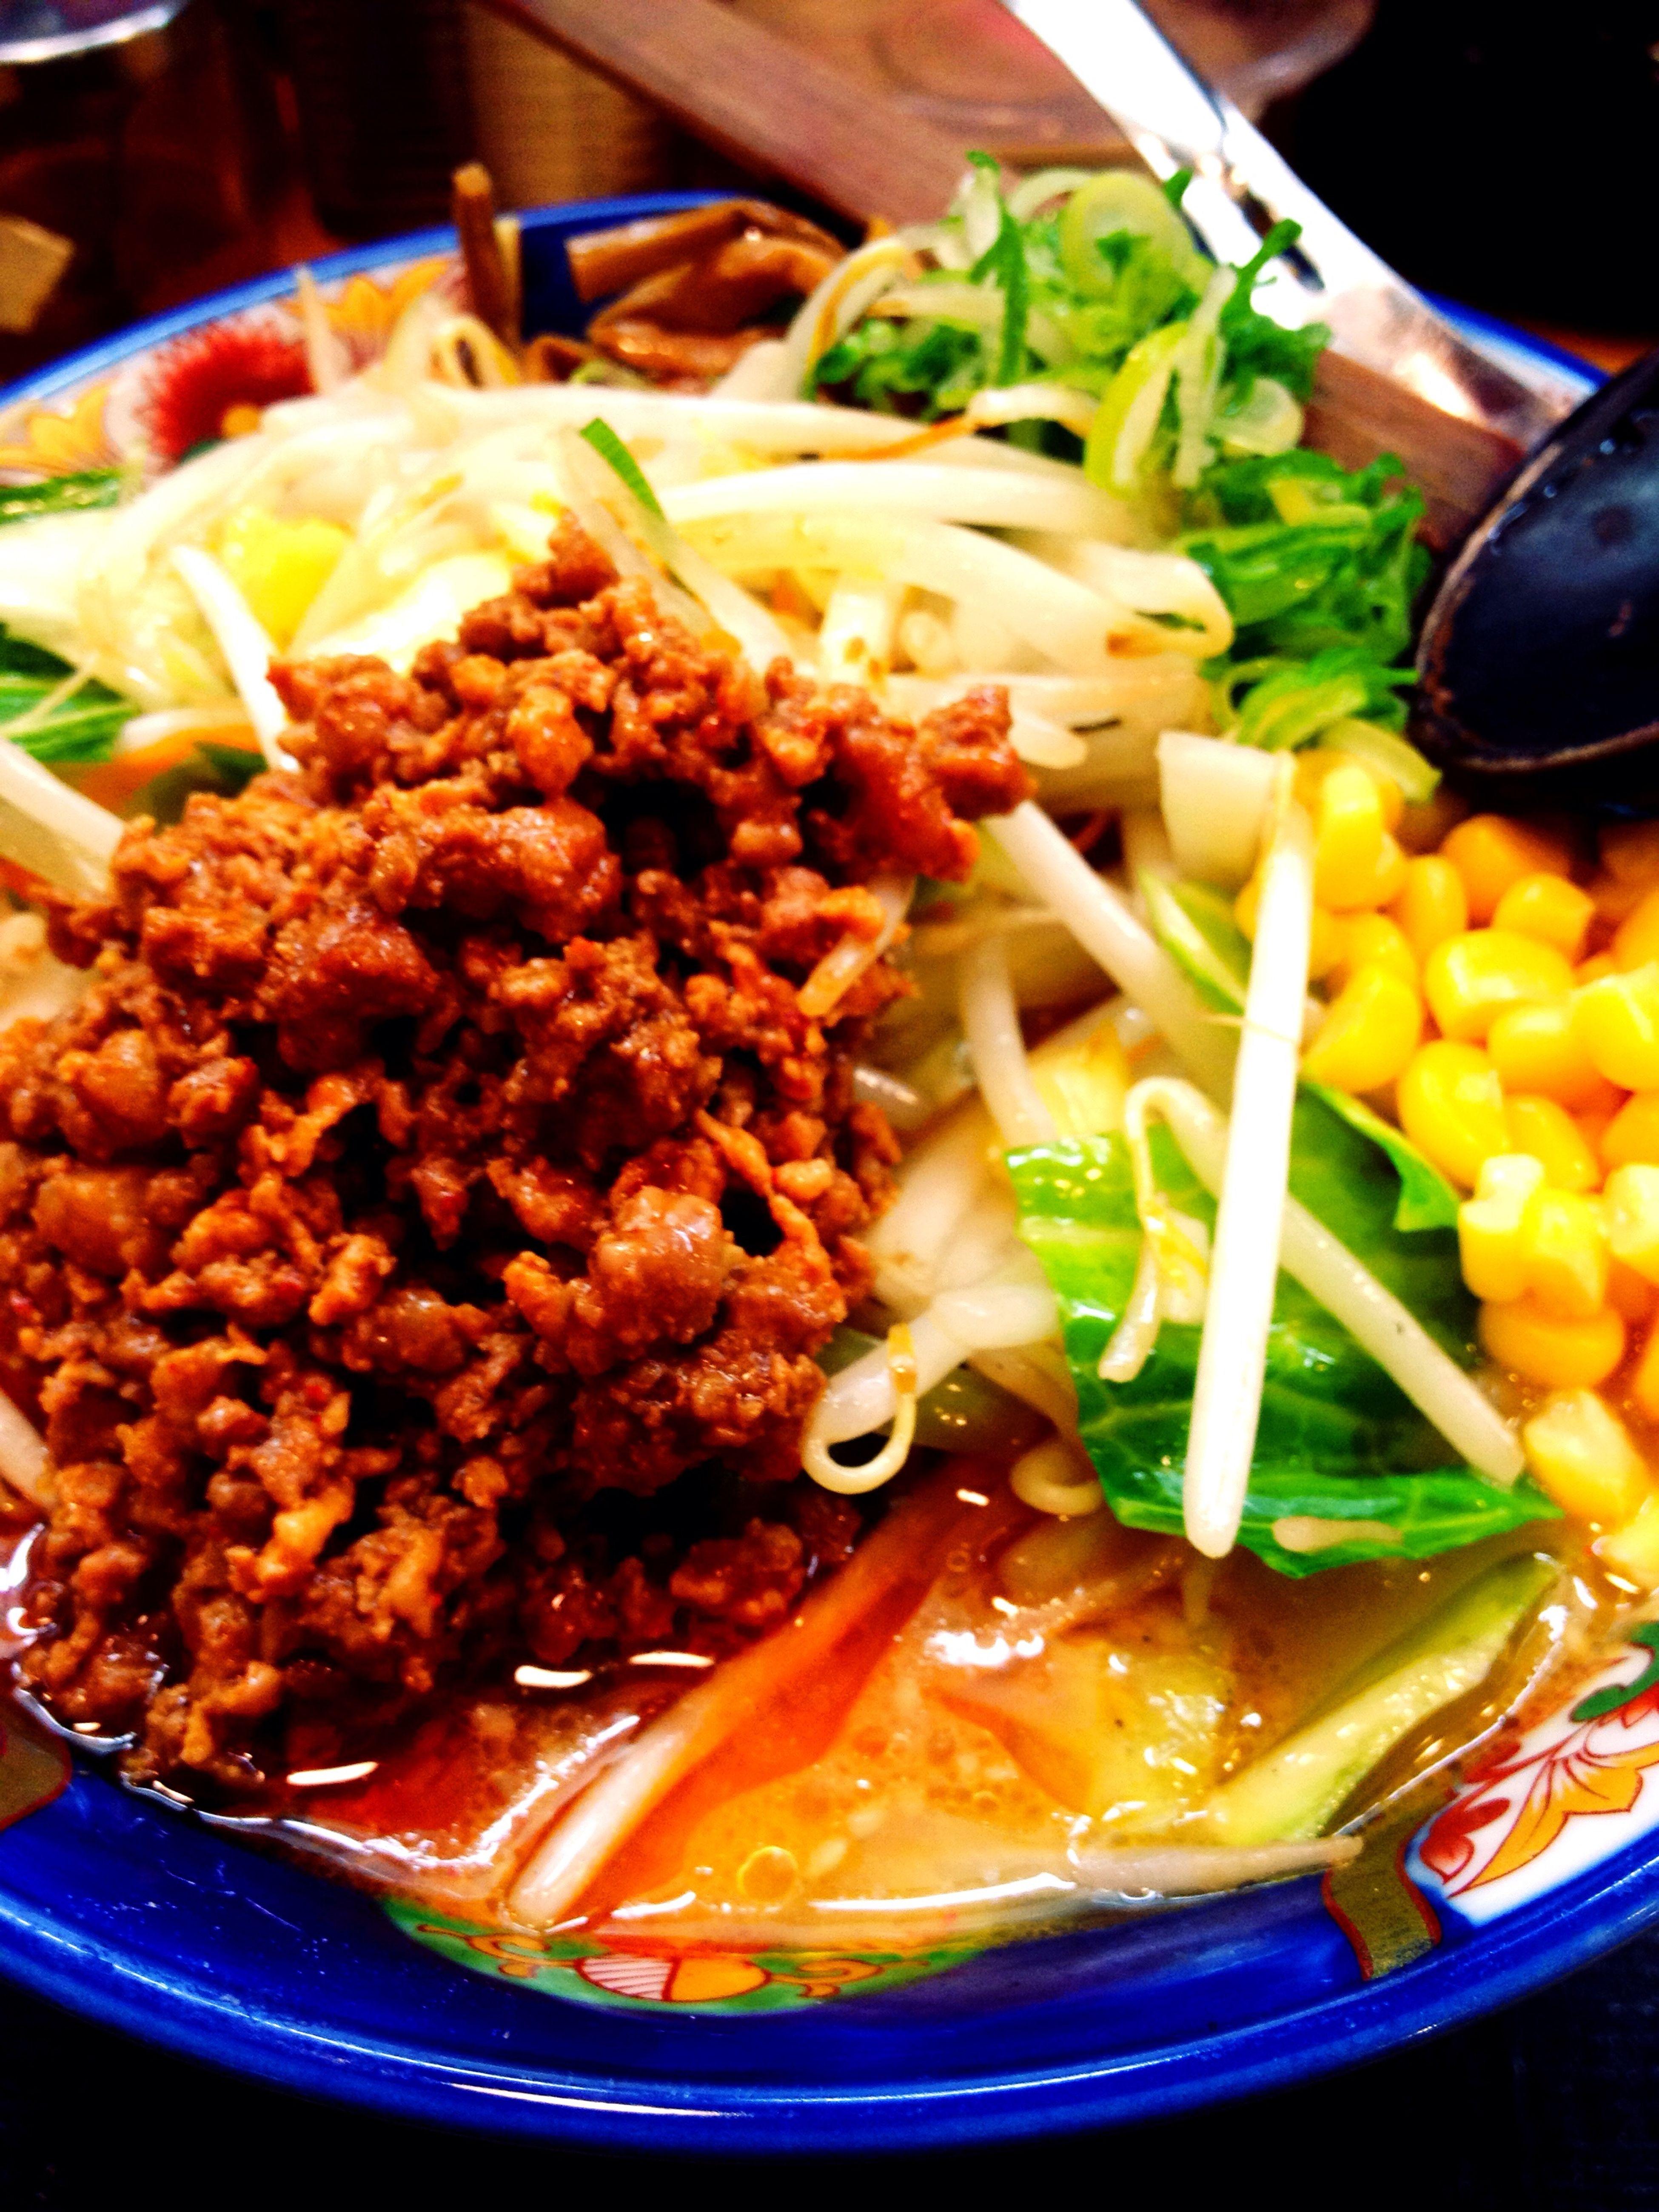 Eating at 一番亭 熱烈タンタン麺 田宮店 Eating